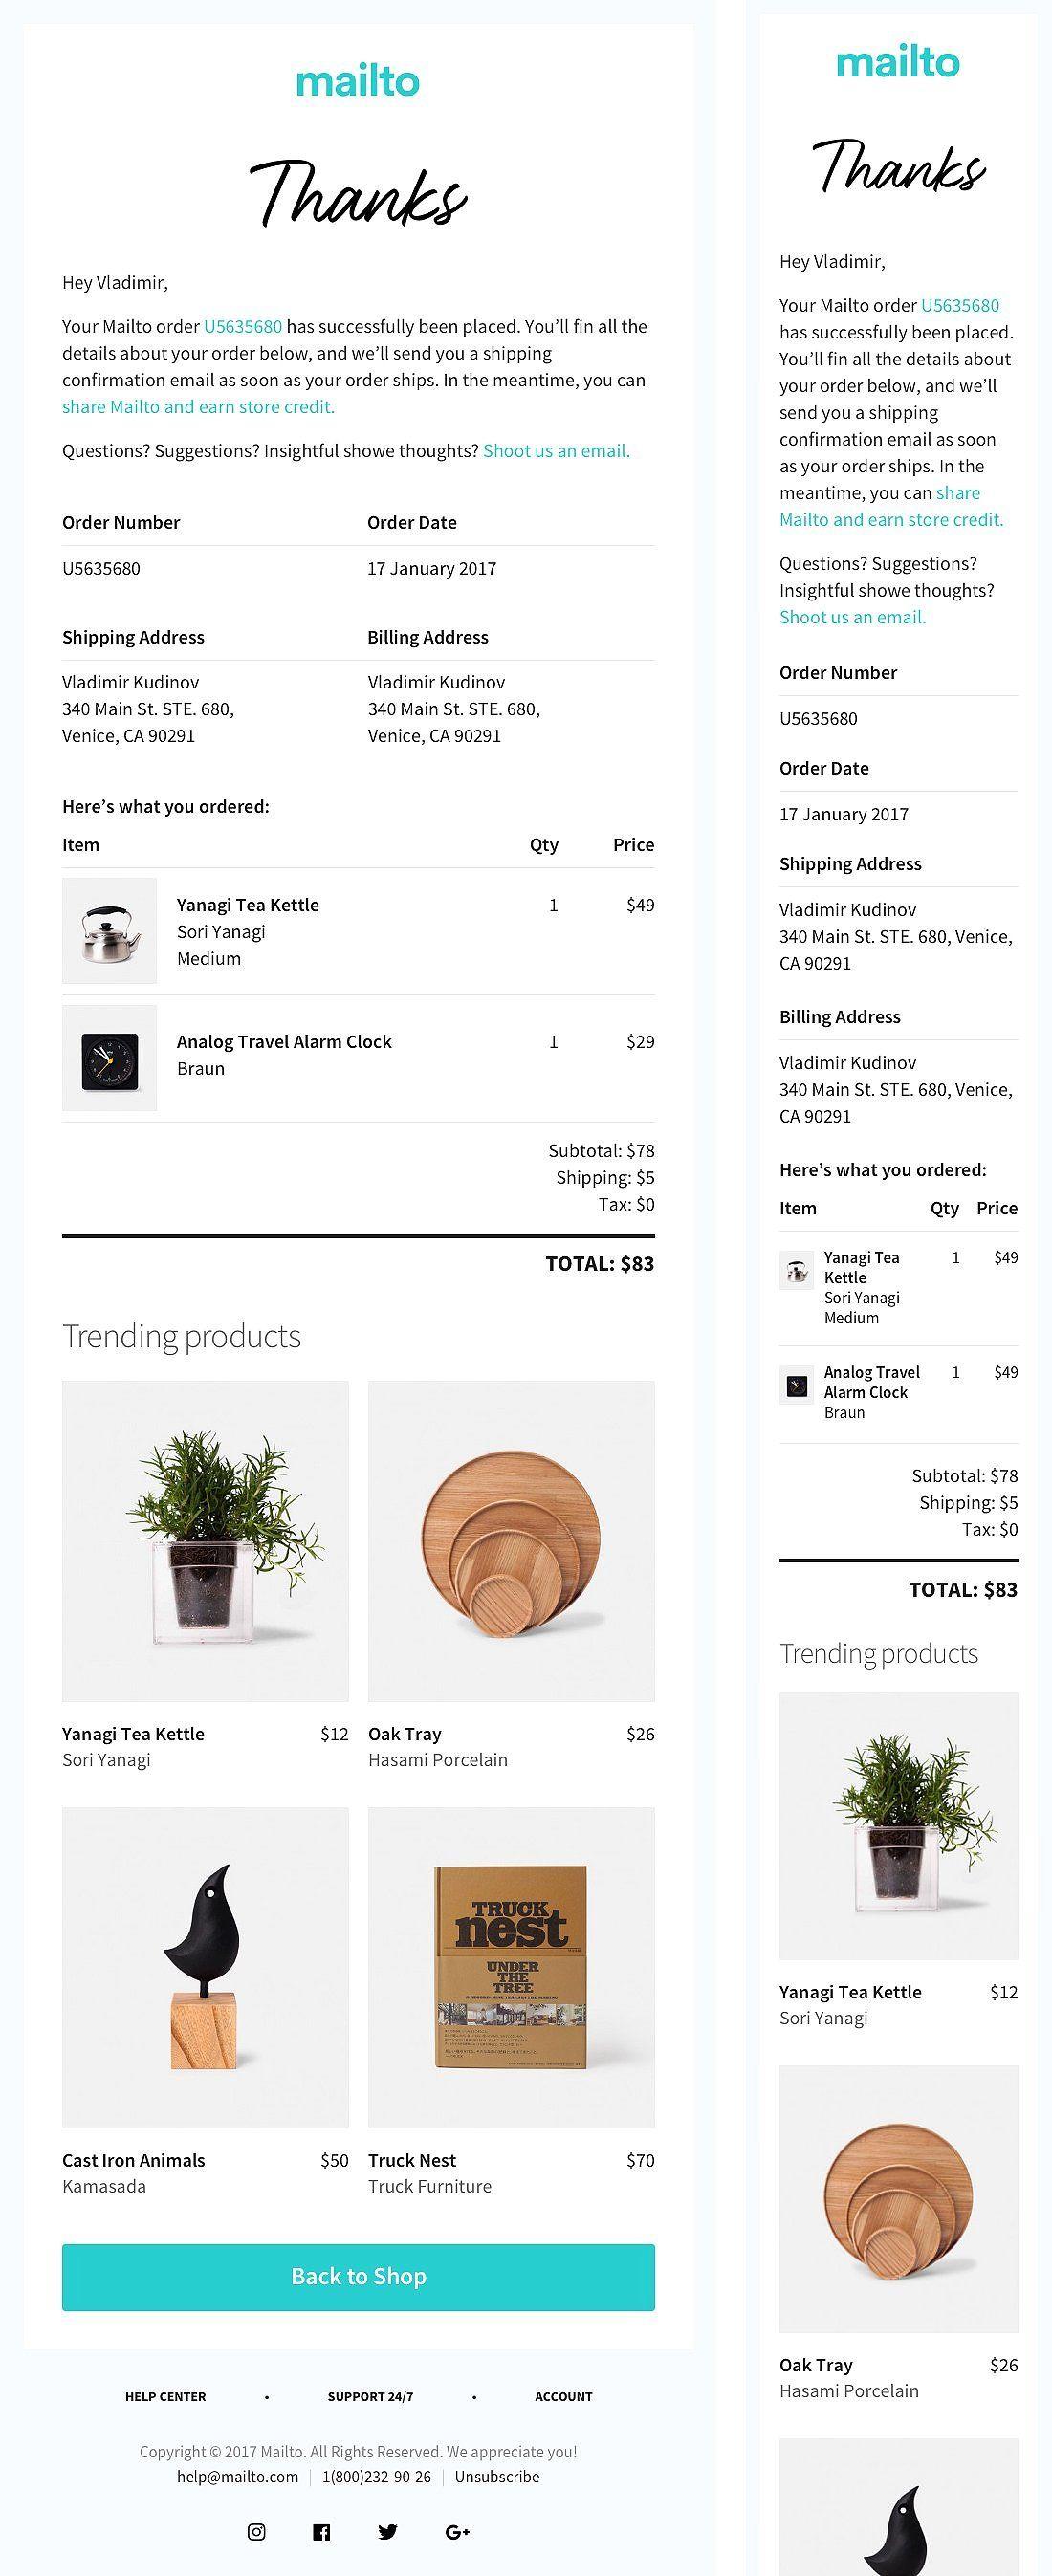 Pin by autumnjuel on marketing Pinterest